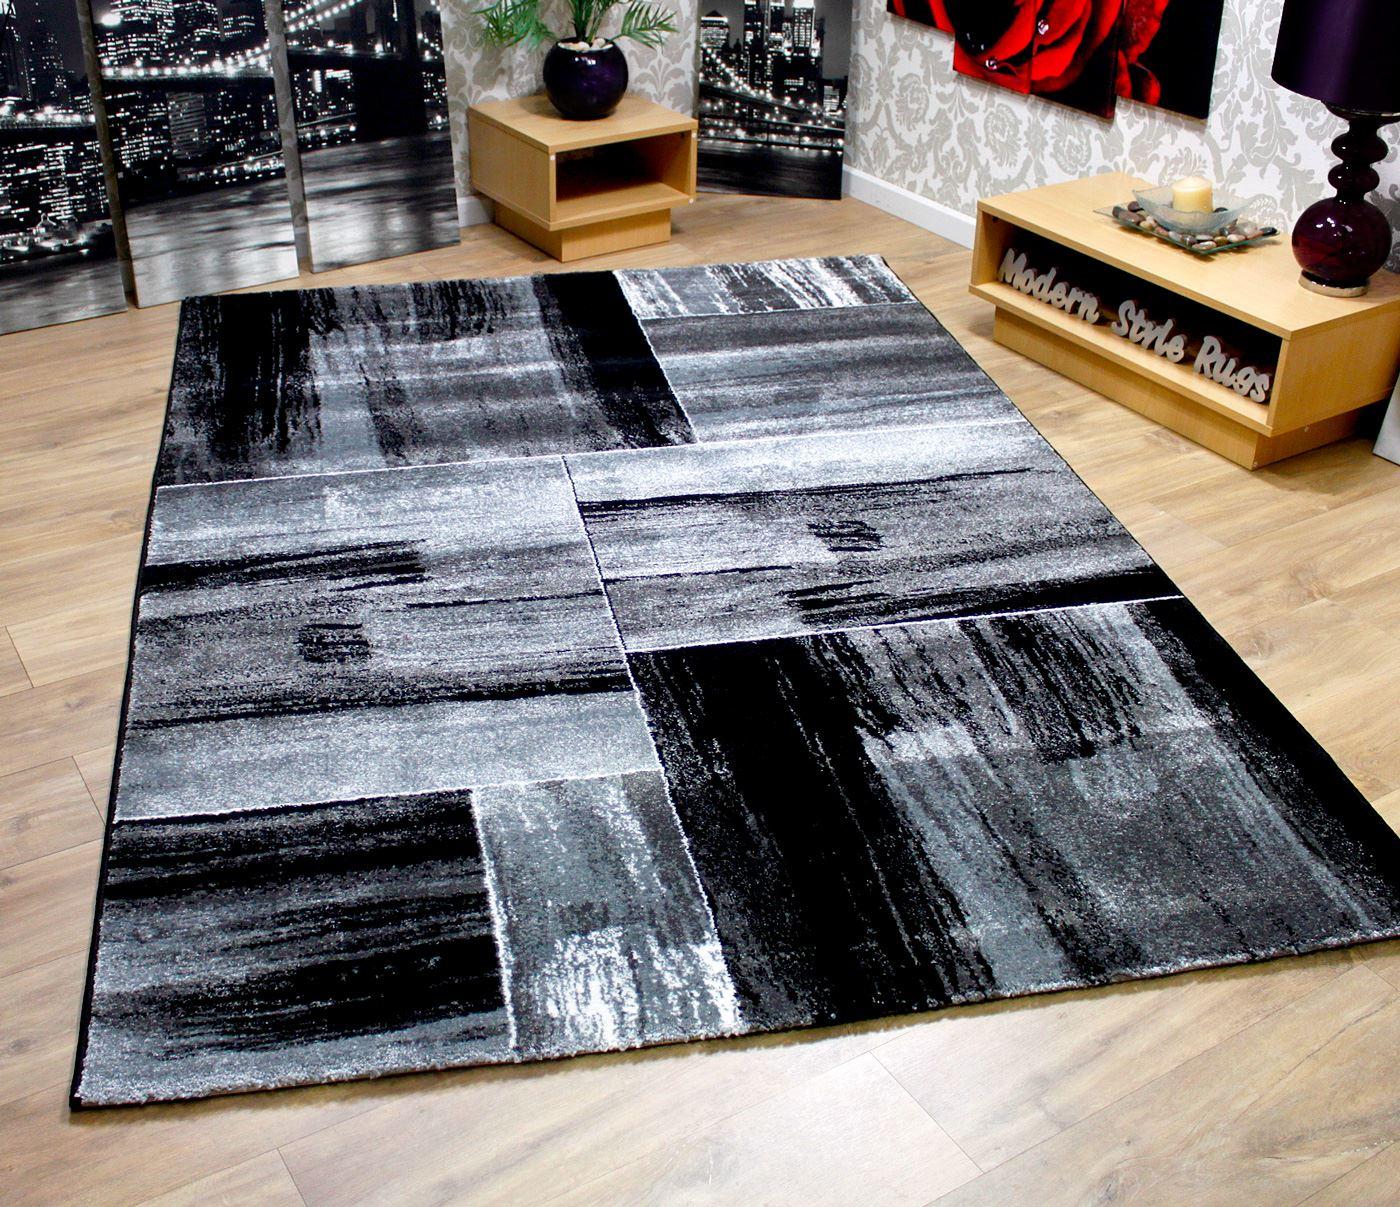 modern black rug hotel ' x ' rug modern black area rug blu dot  - modern square pattern contemporary designer rugs black red greenmodernsquarepatterncontemporarydesignerrugsblackred